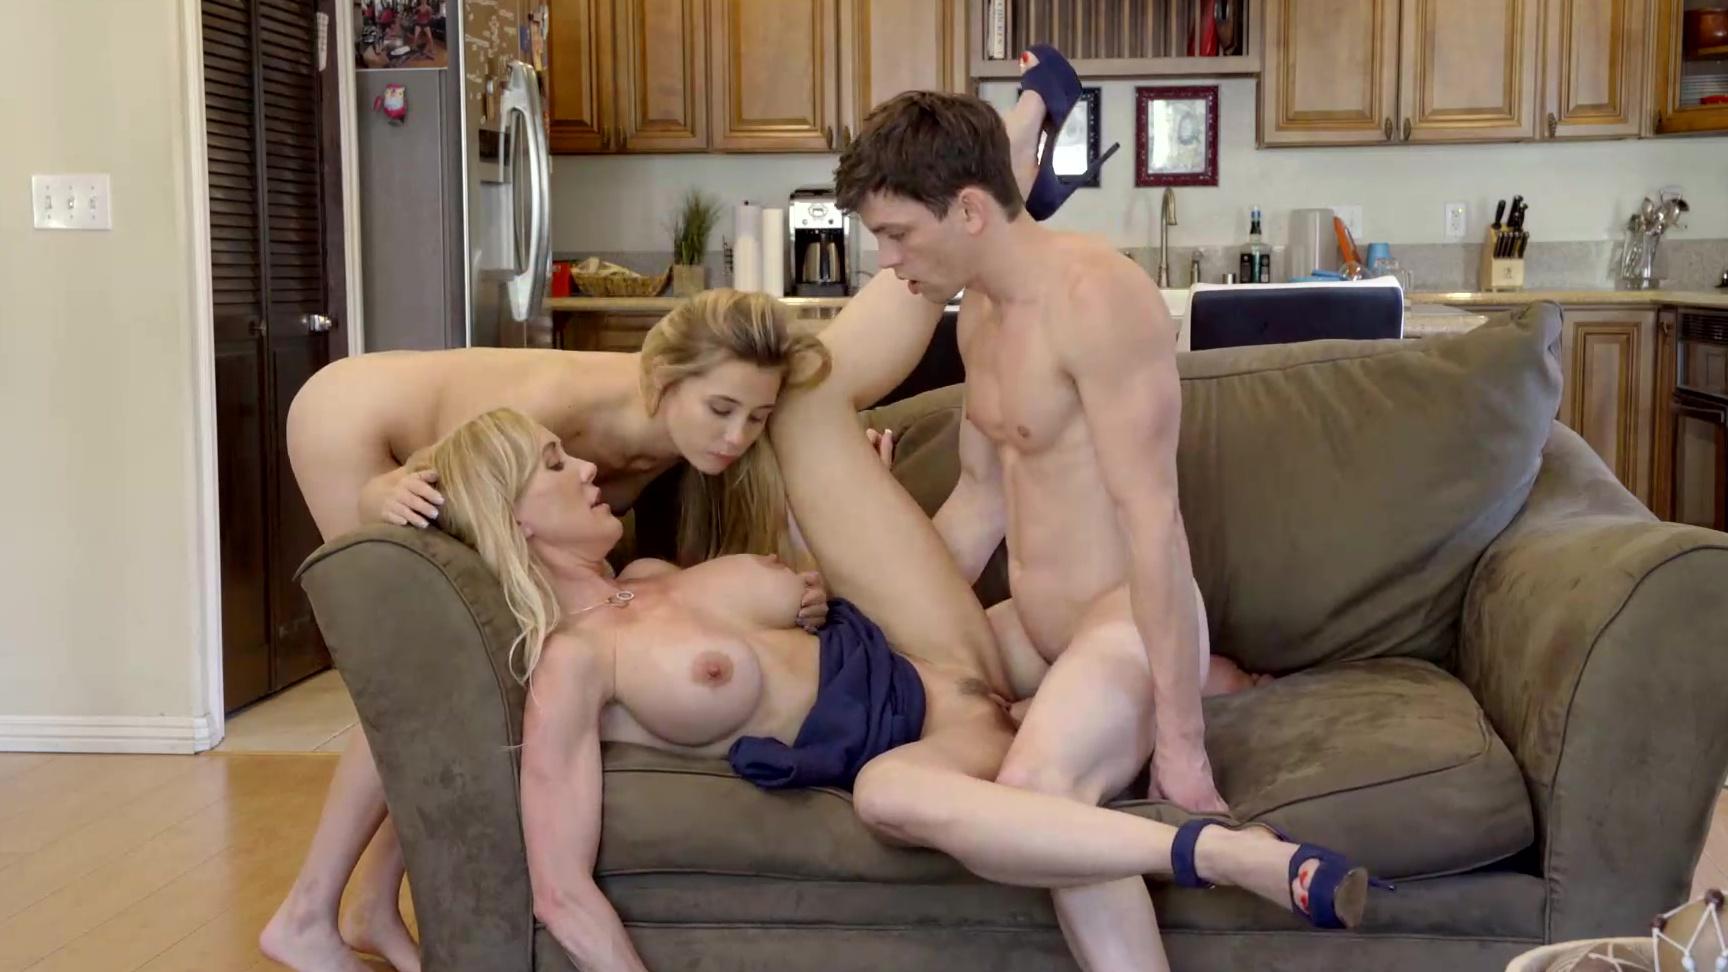 Natalie demore gets pussy spanked